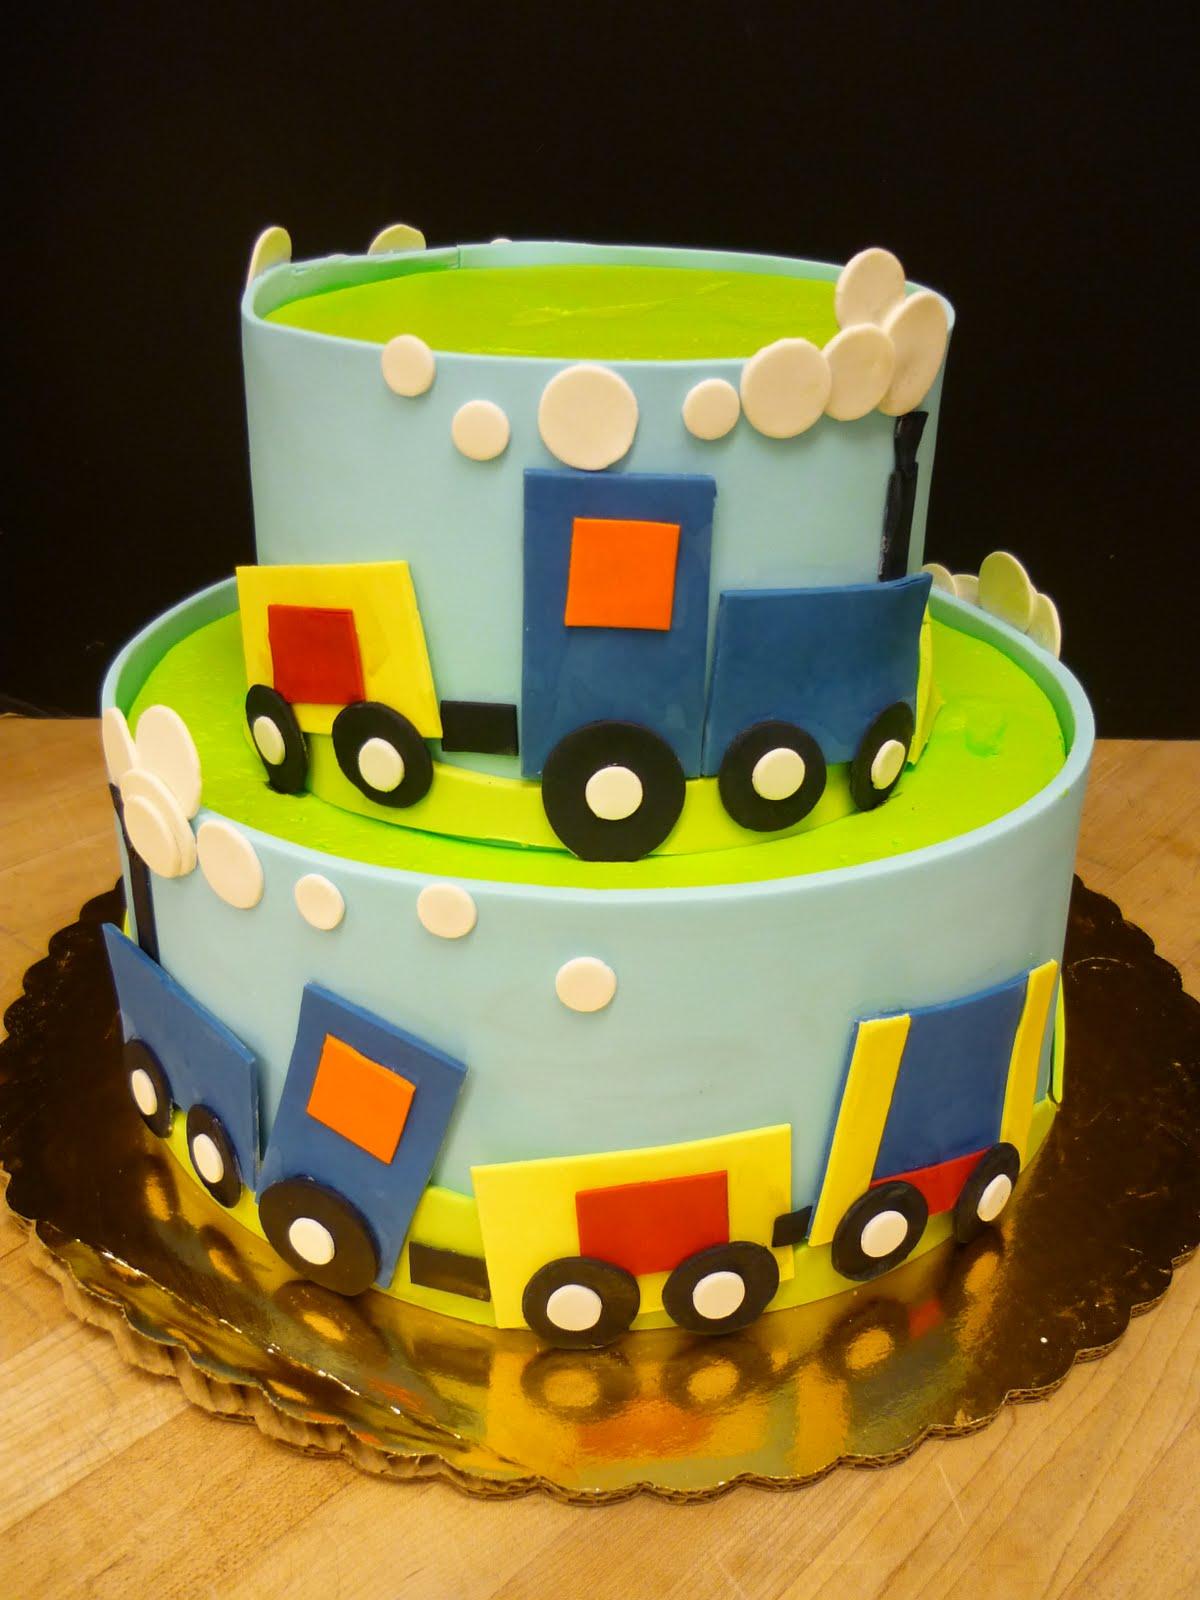 11 Children Birthday Cakes Boys Photo Boys Birthday Cake Ideas